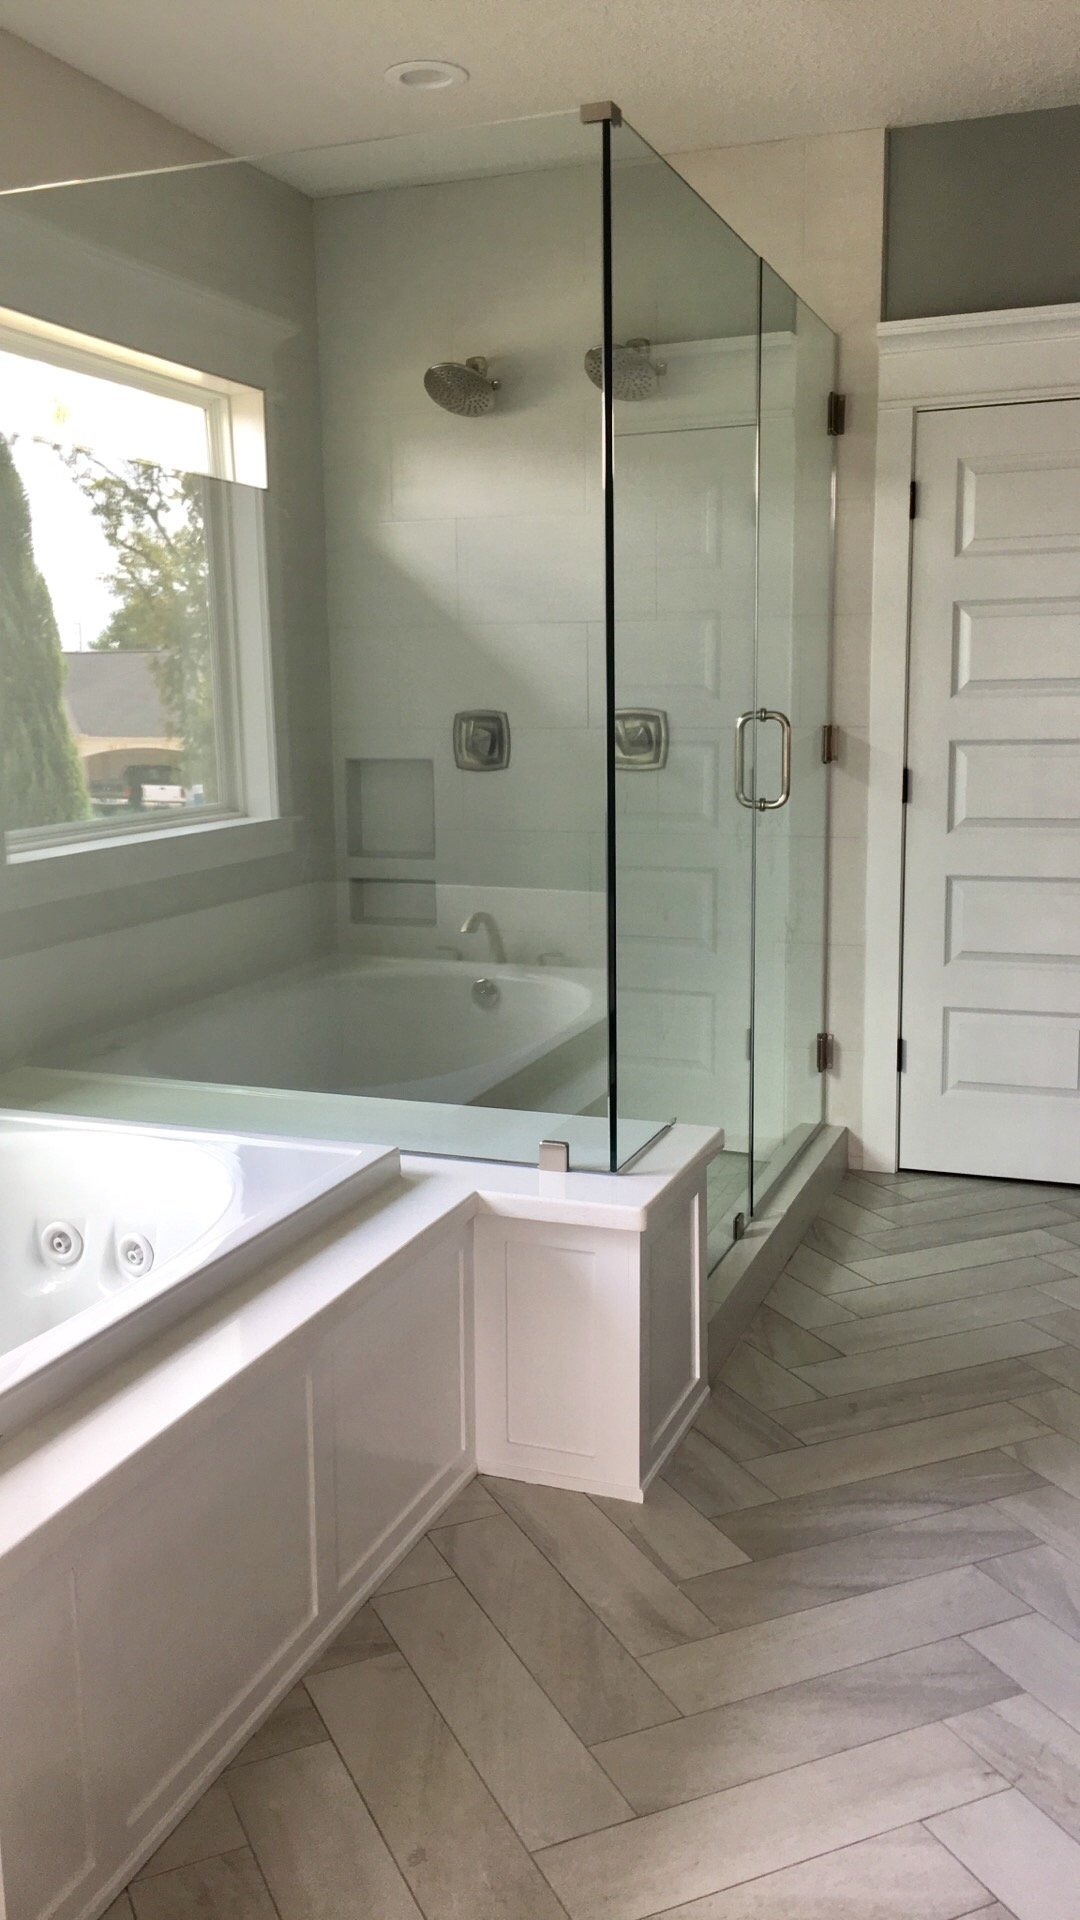 hardwood flooring and glass shower